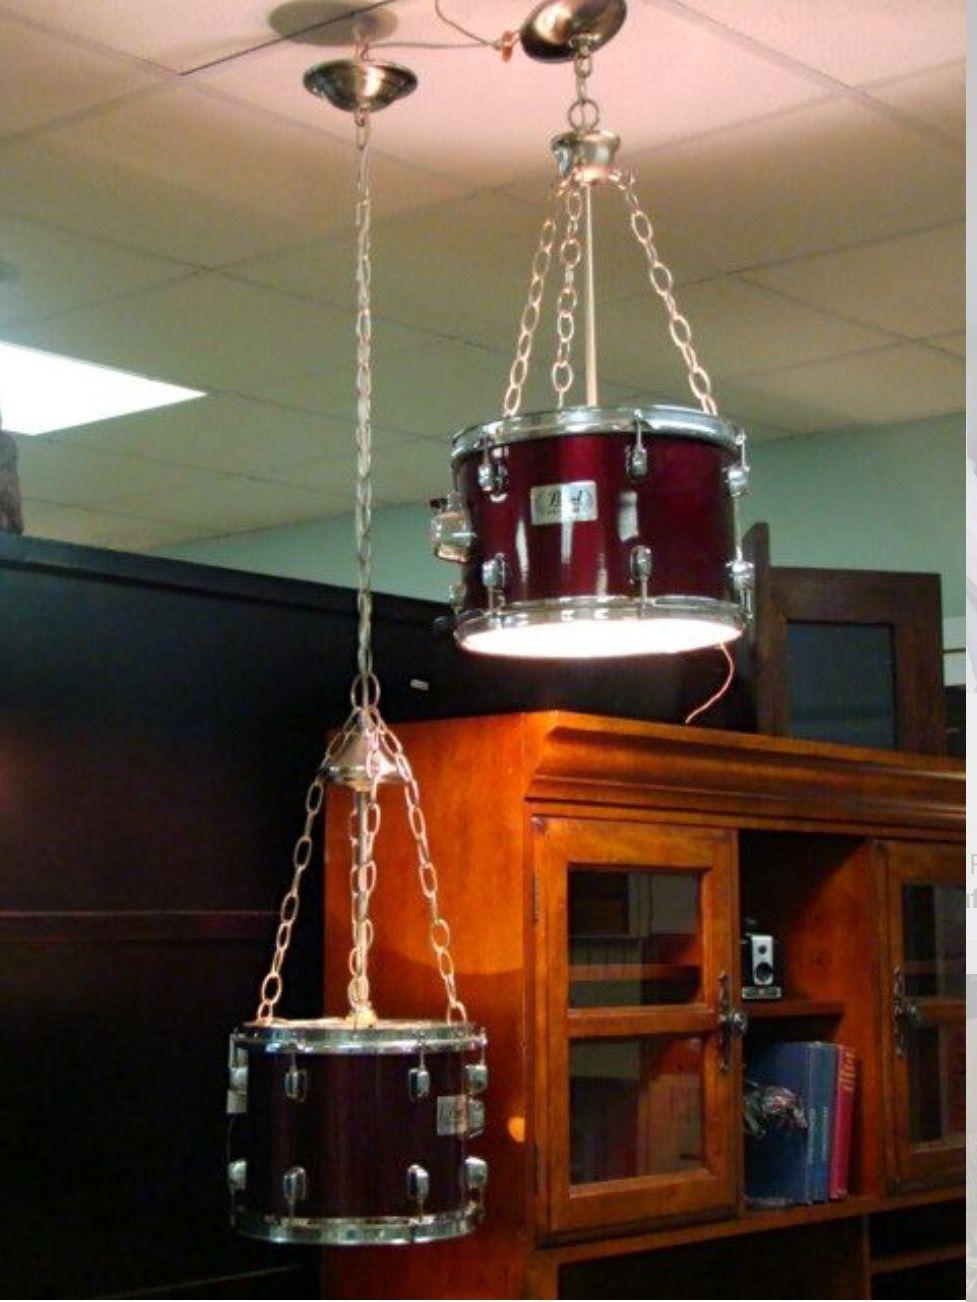 Band Room Design: Hanging Drum Ceiling Light ~